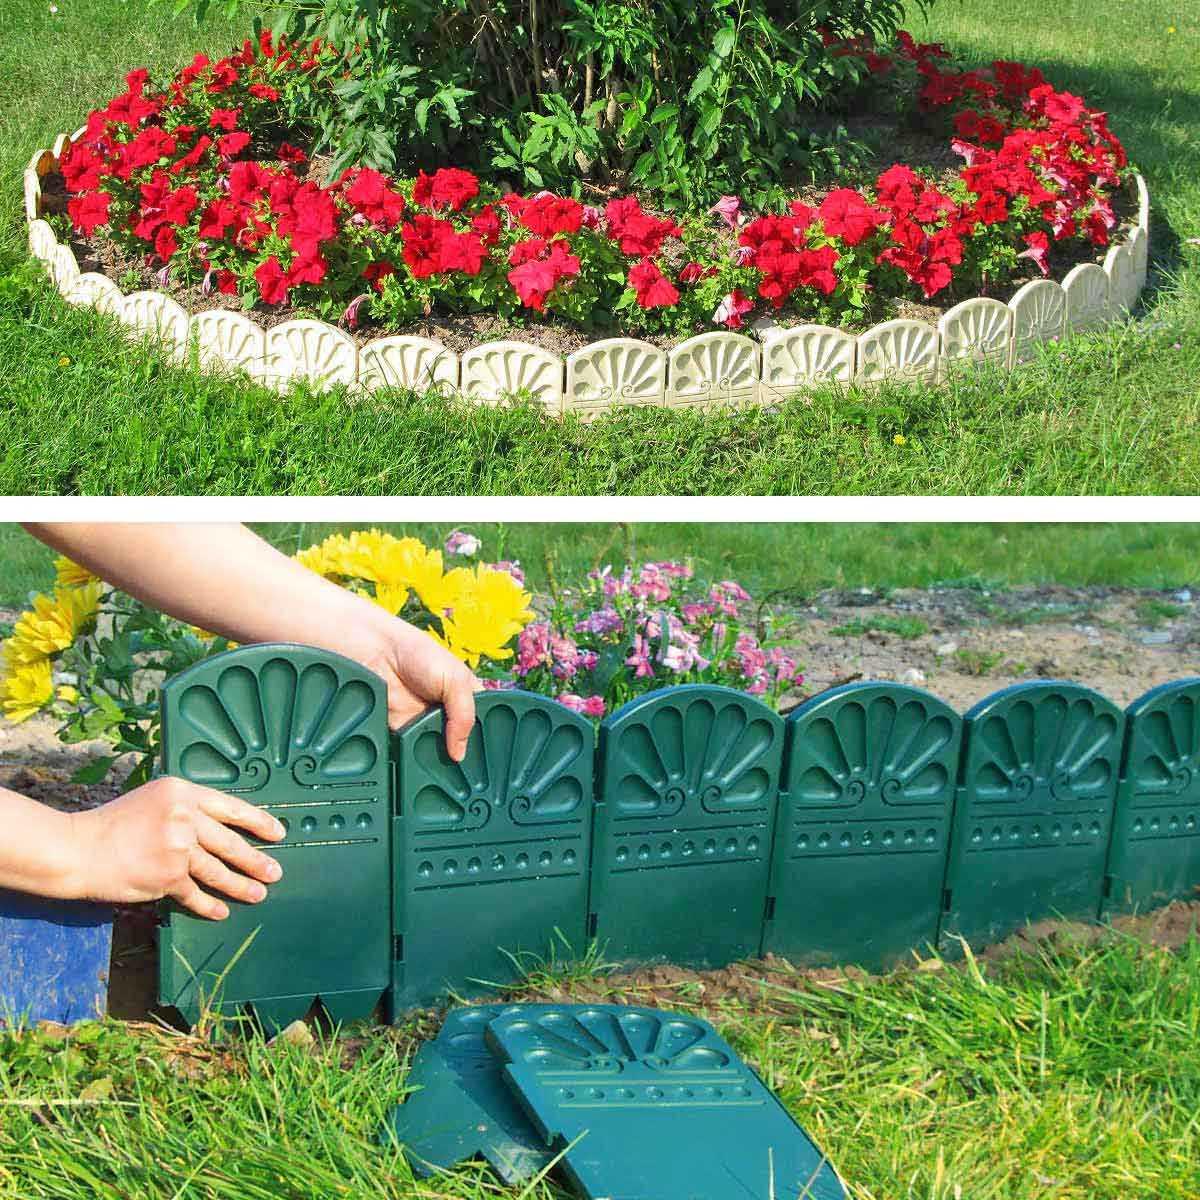 Bordures Décoratives De Jardin En Plastique dedans Bordurette De Jardin